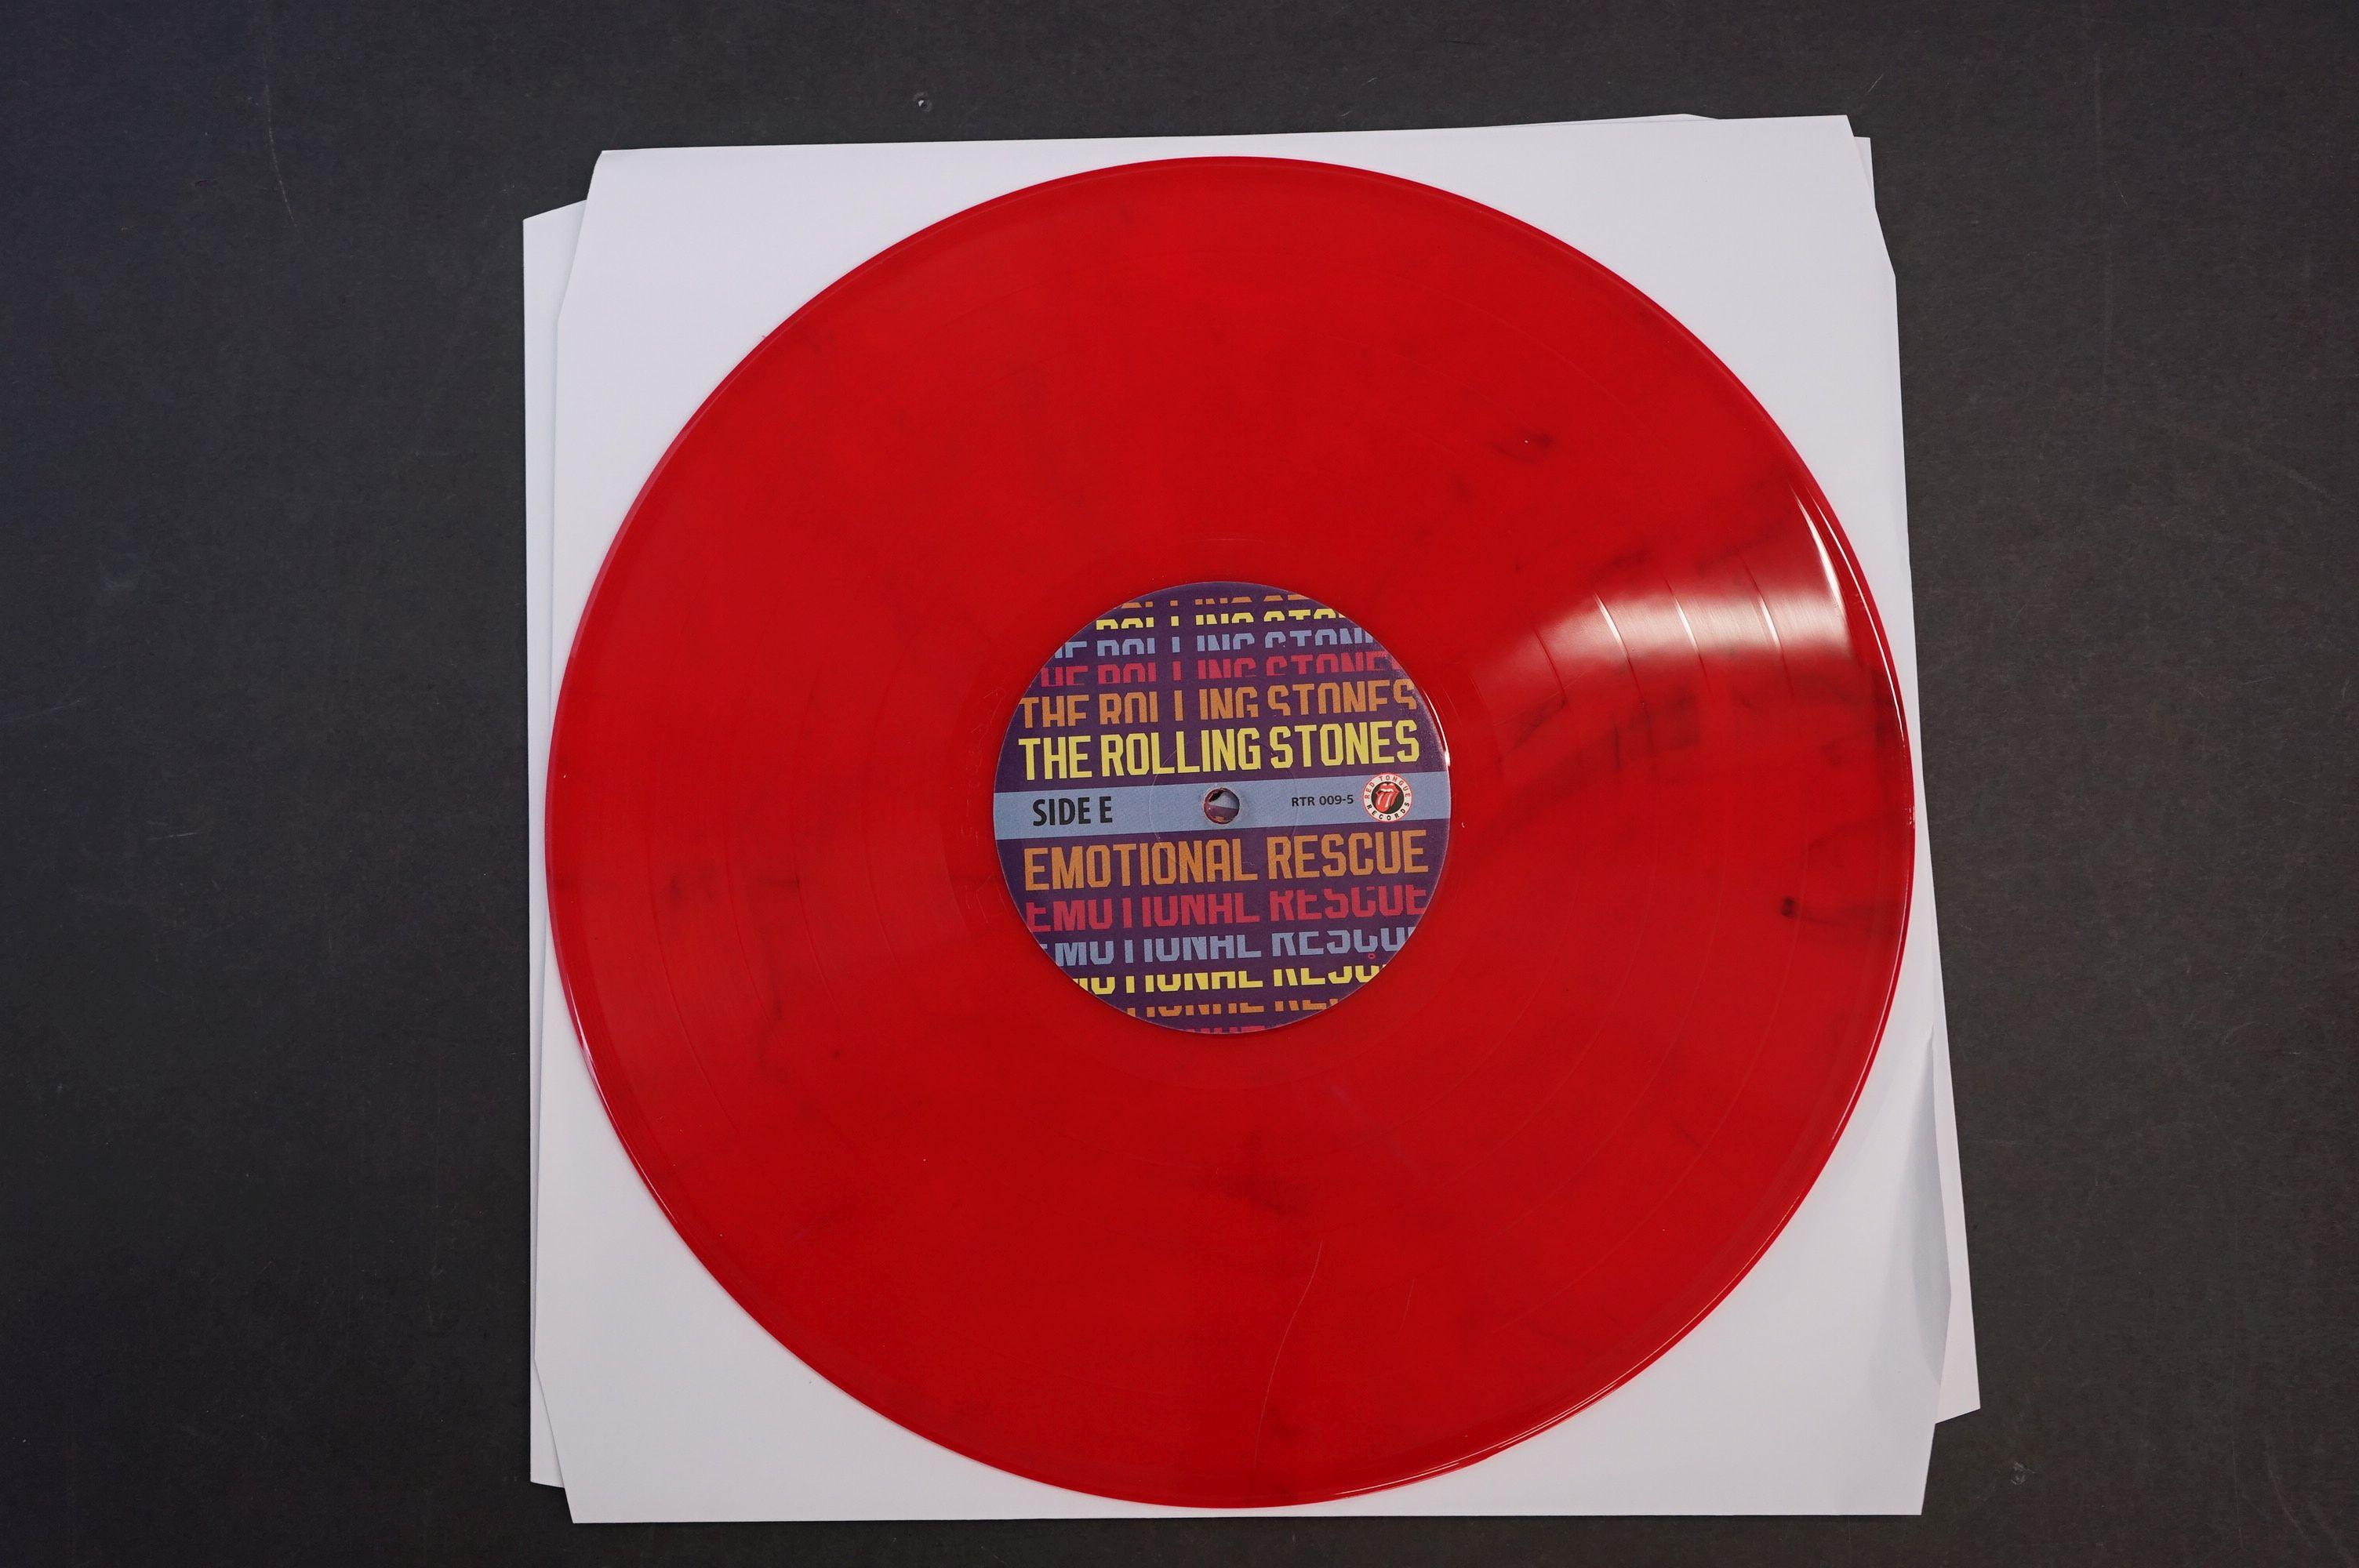 Vinyl - ltd edn The Real Alternate Album Rolling Stones Emotional Rescue 4 LP / 2 CD Box Set, - Image 8 of 12